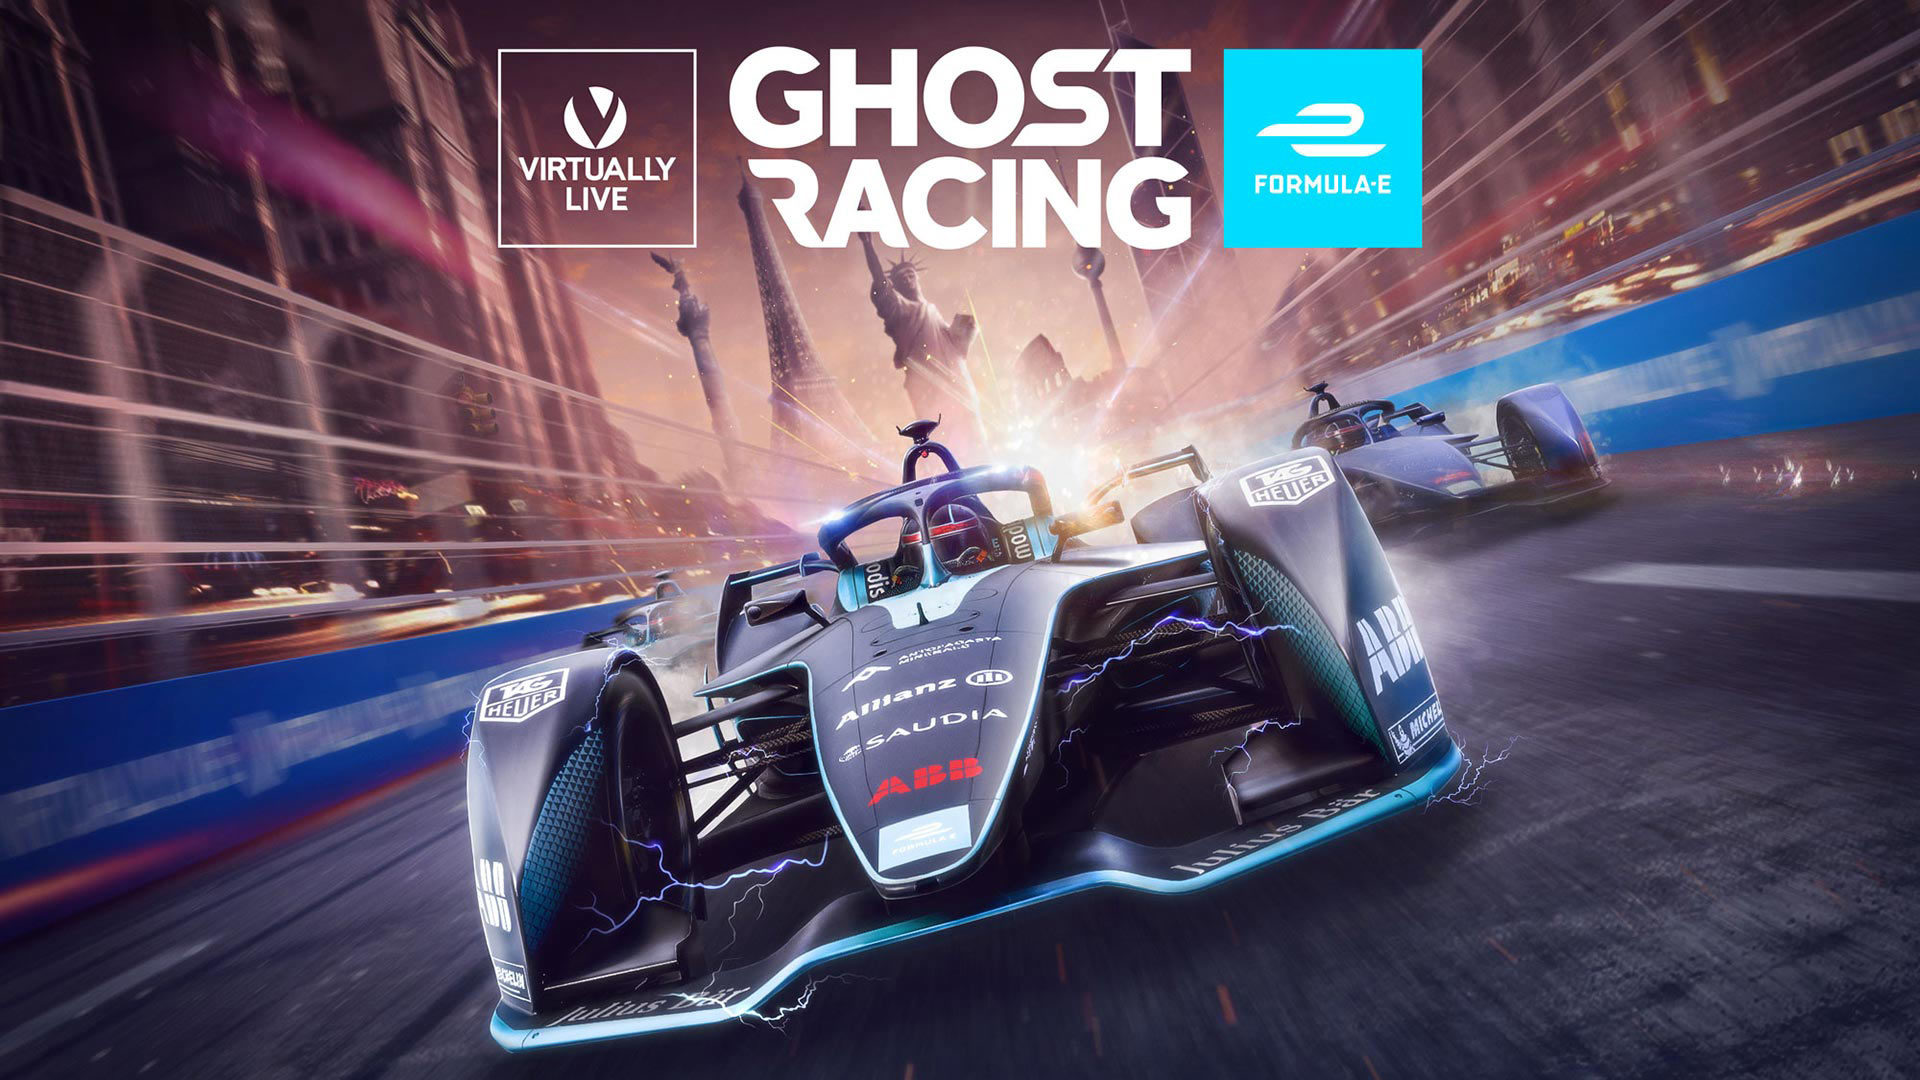 Virtually Live Formula E Ghost Racing